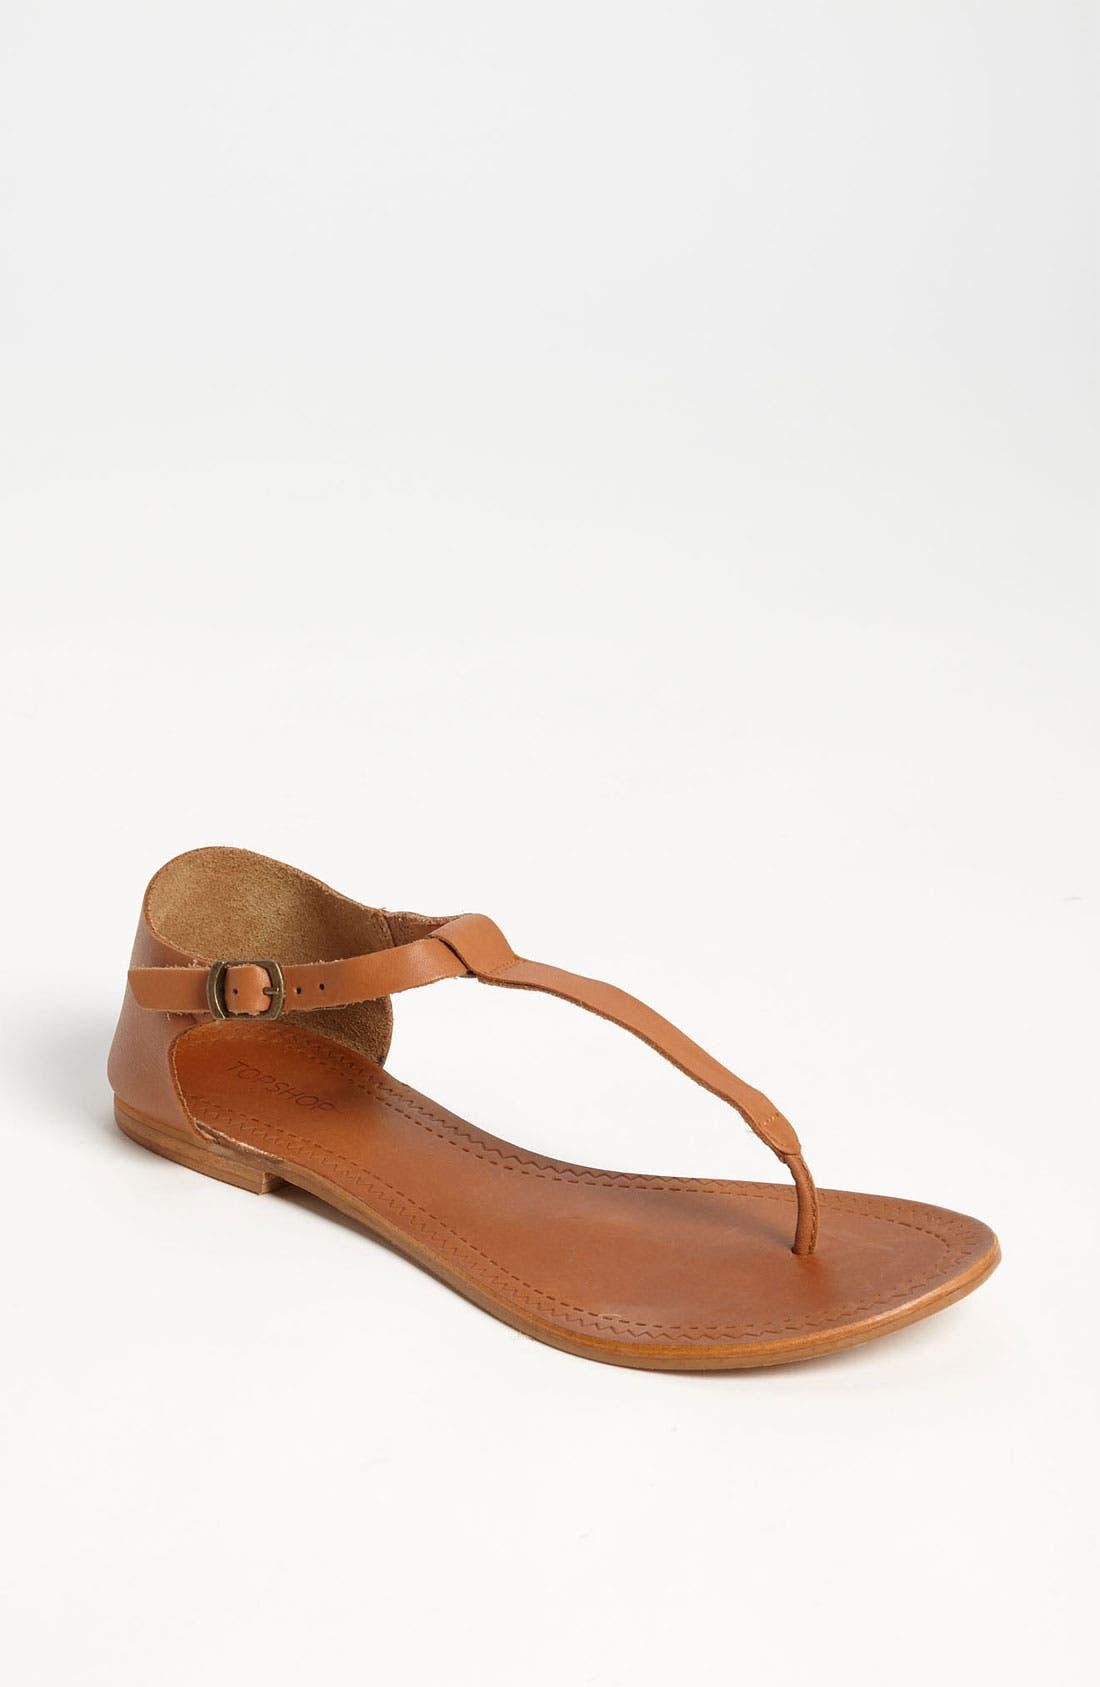 Main Image - Topshop 'Hix' Sandal